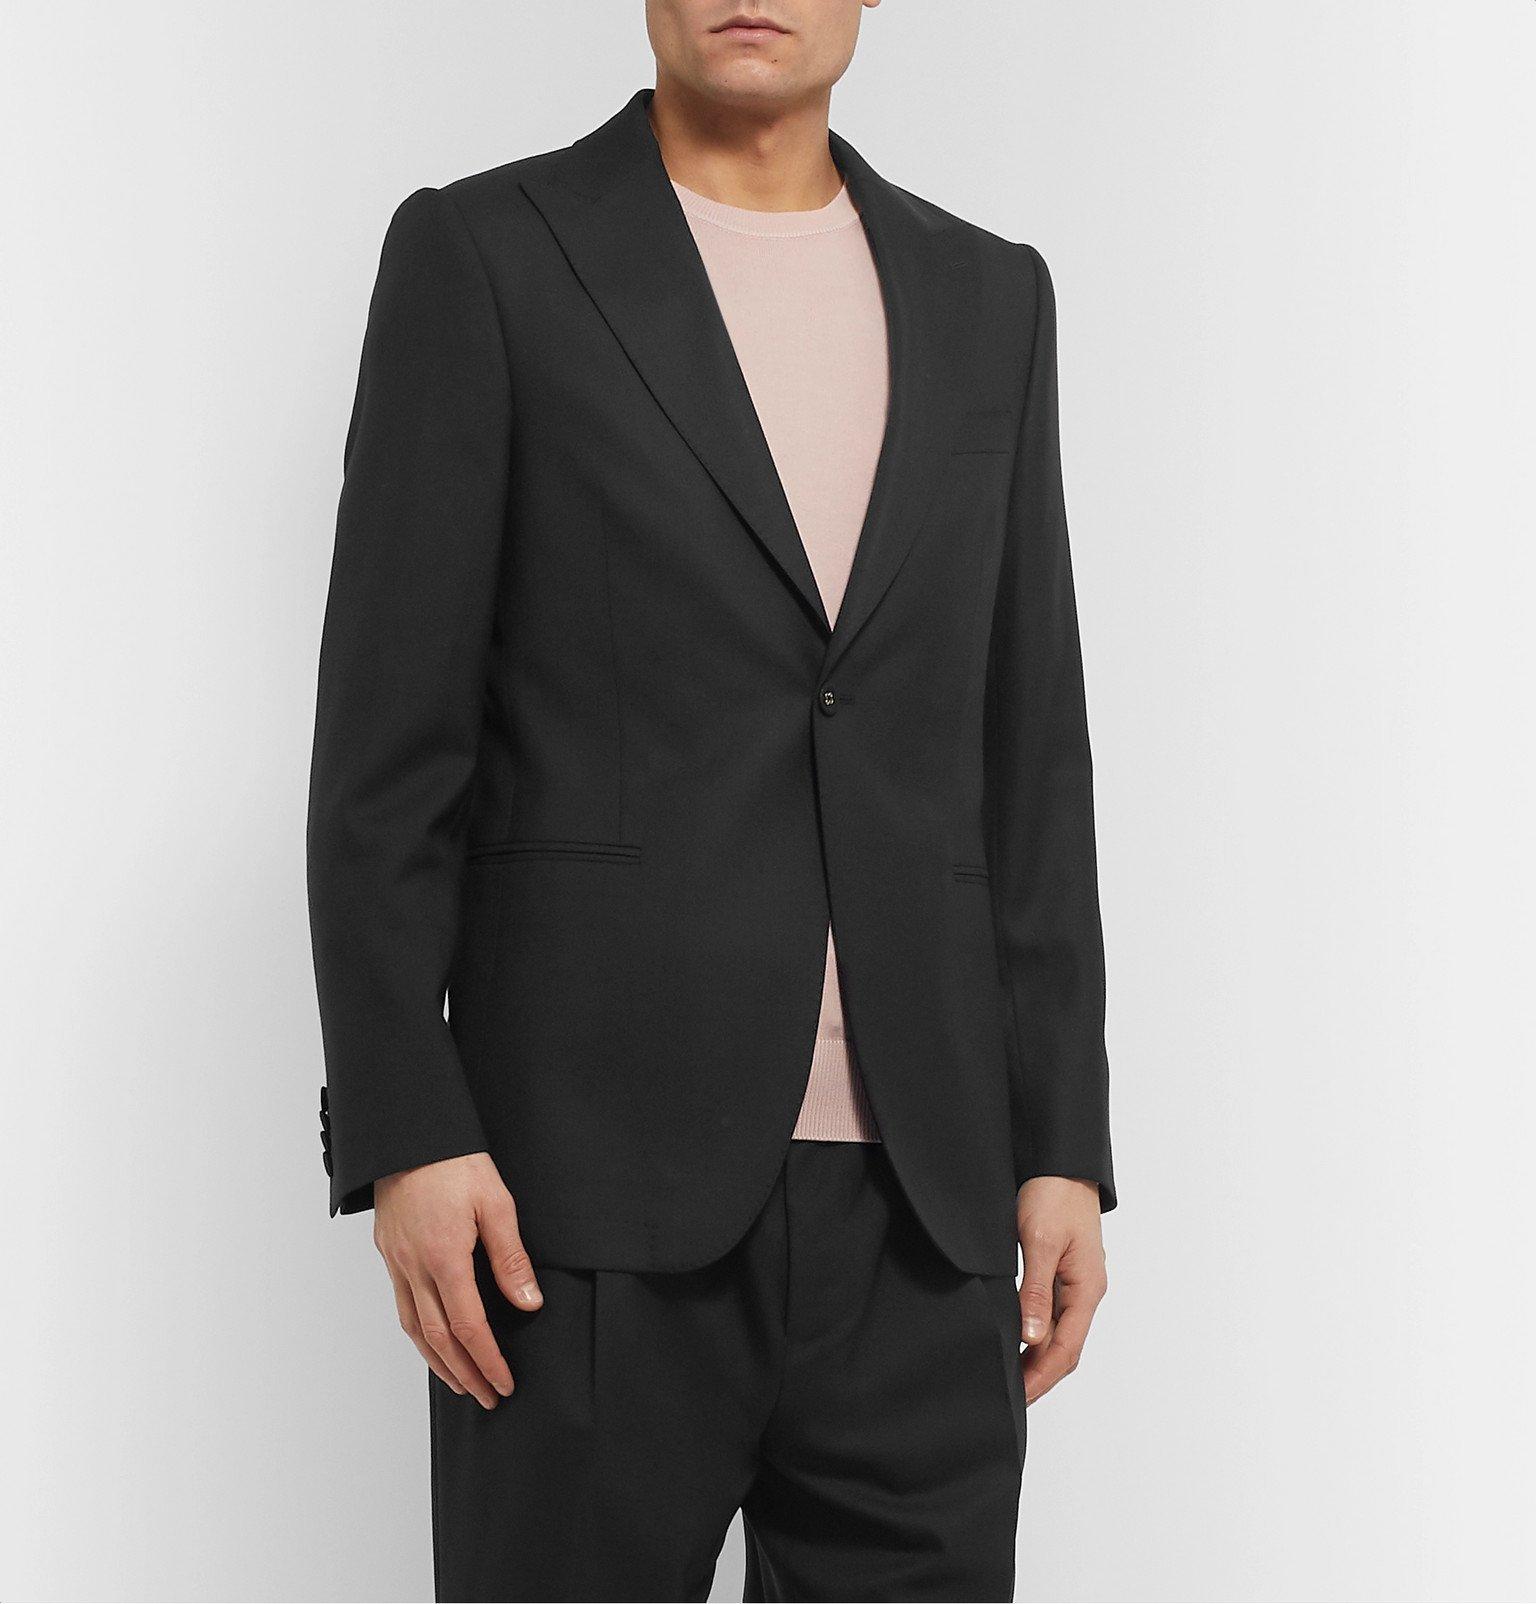 Officine Generale - Black Marcello Wool Suit Jacket - Black